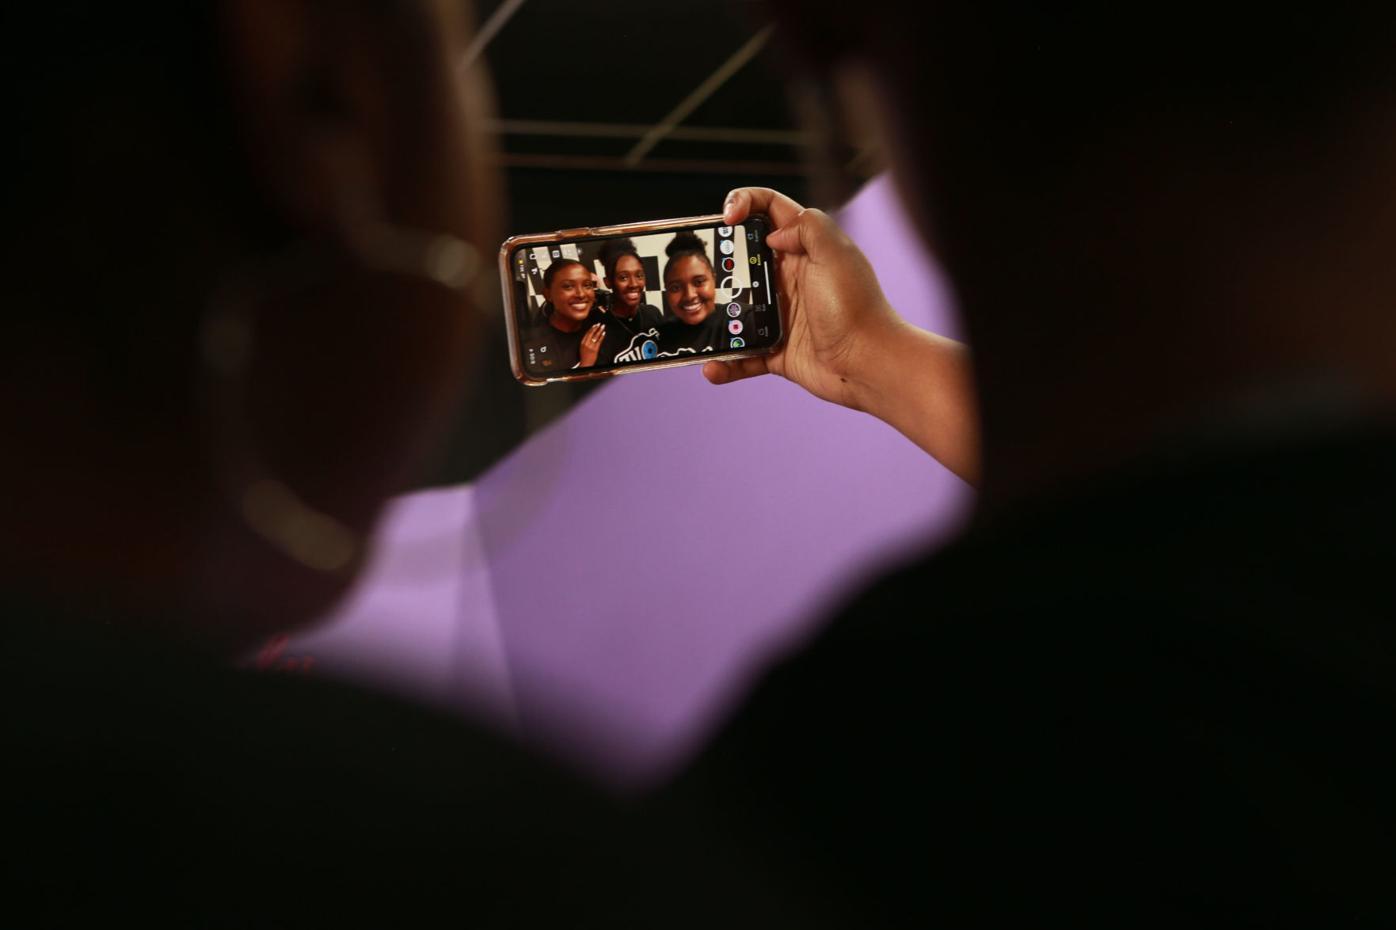 djr-2021-07-16-biz-selfie-store-twp3